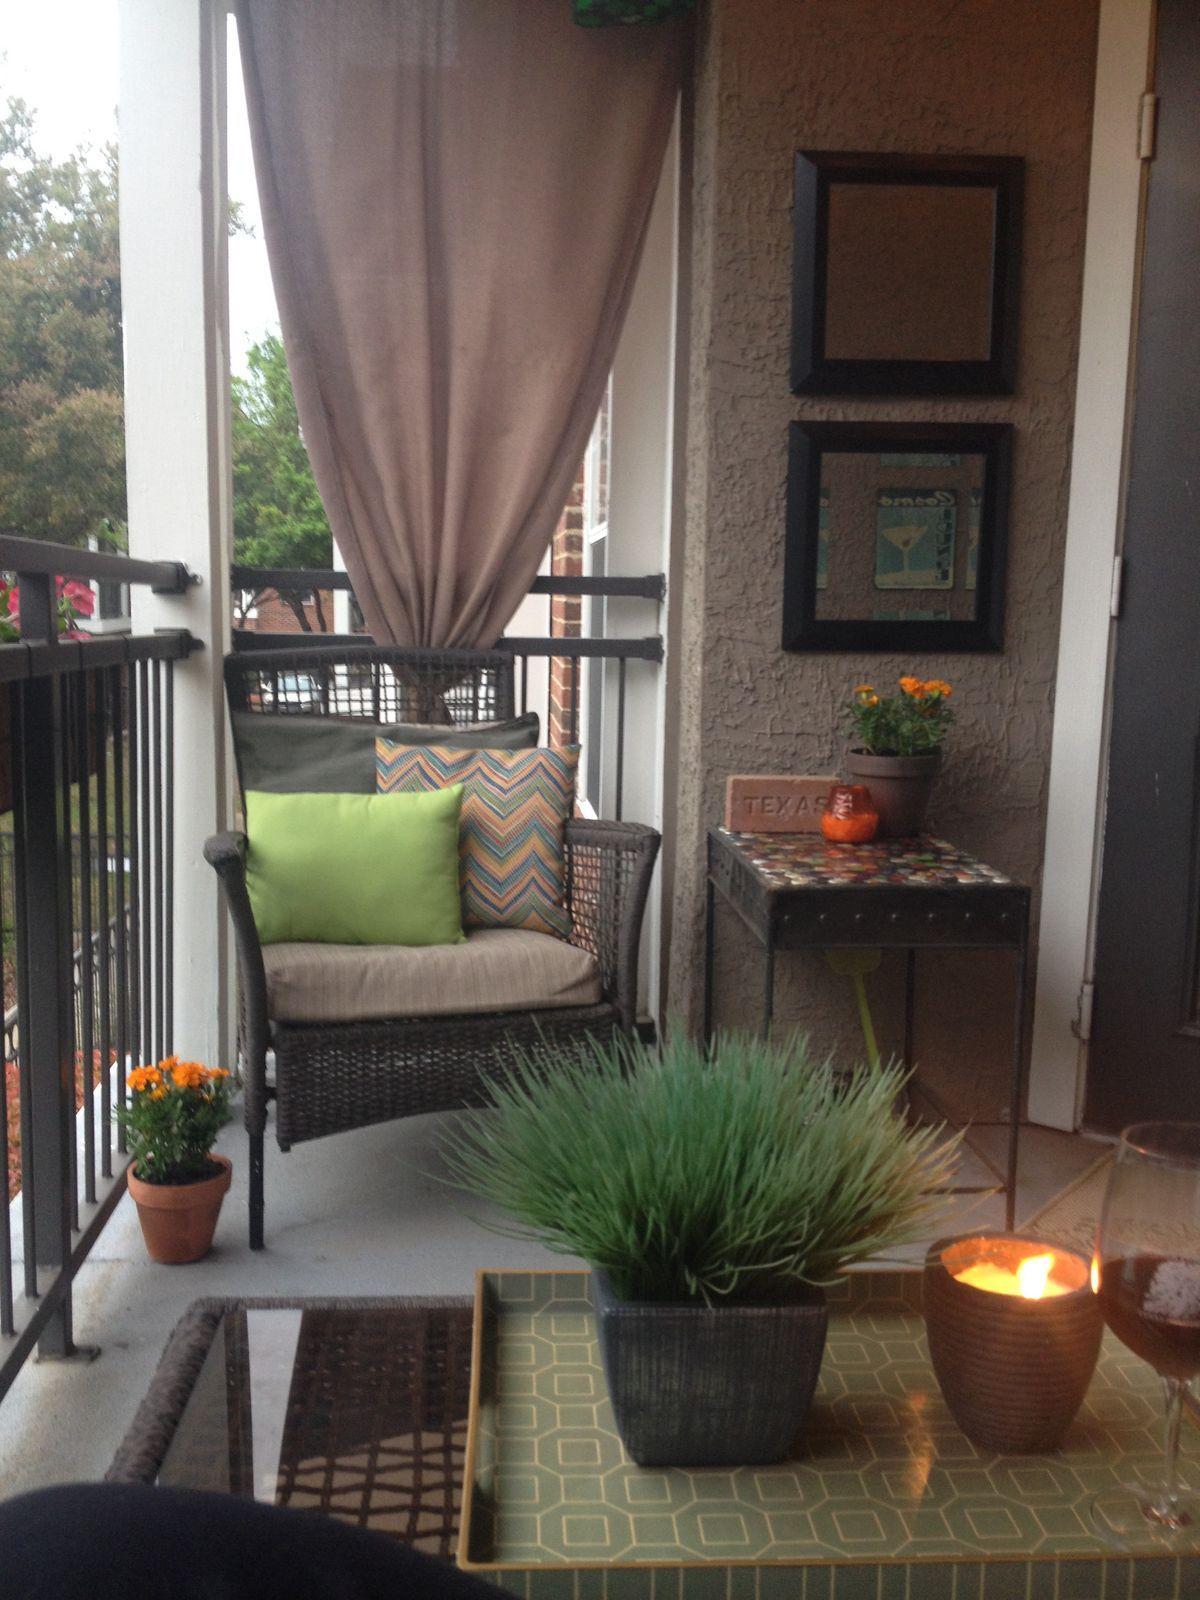 6369fa79e5fd05833579d2fedd094046 jpg 1 200 1 600 pixels decoração de varanda on christmas balcony decorations apartment patio id=74520